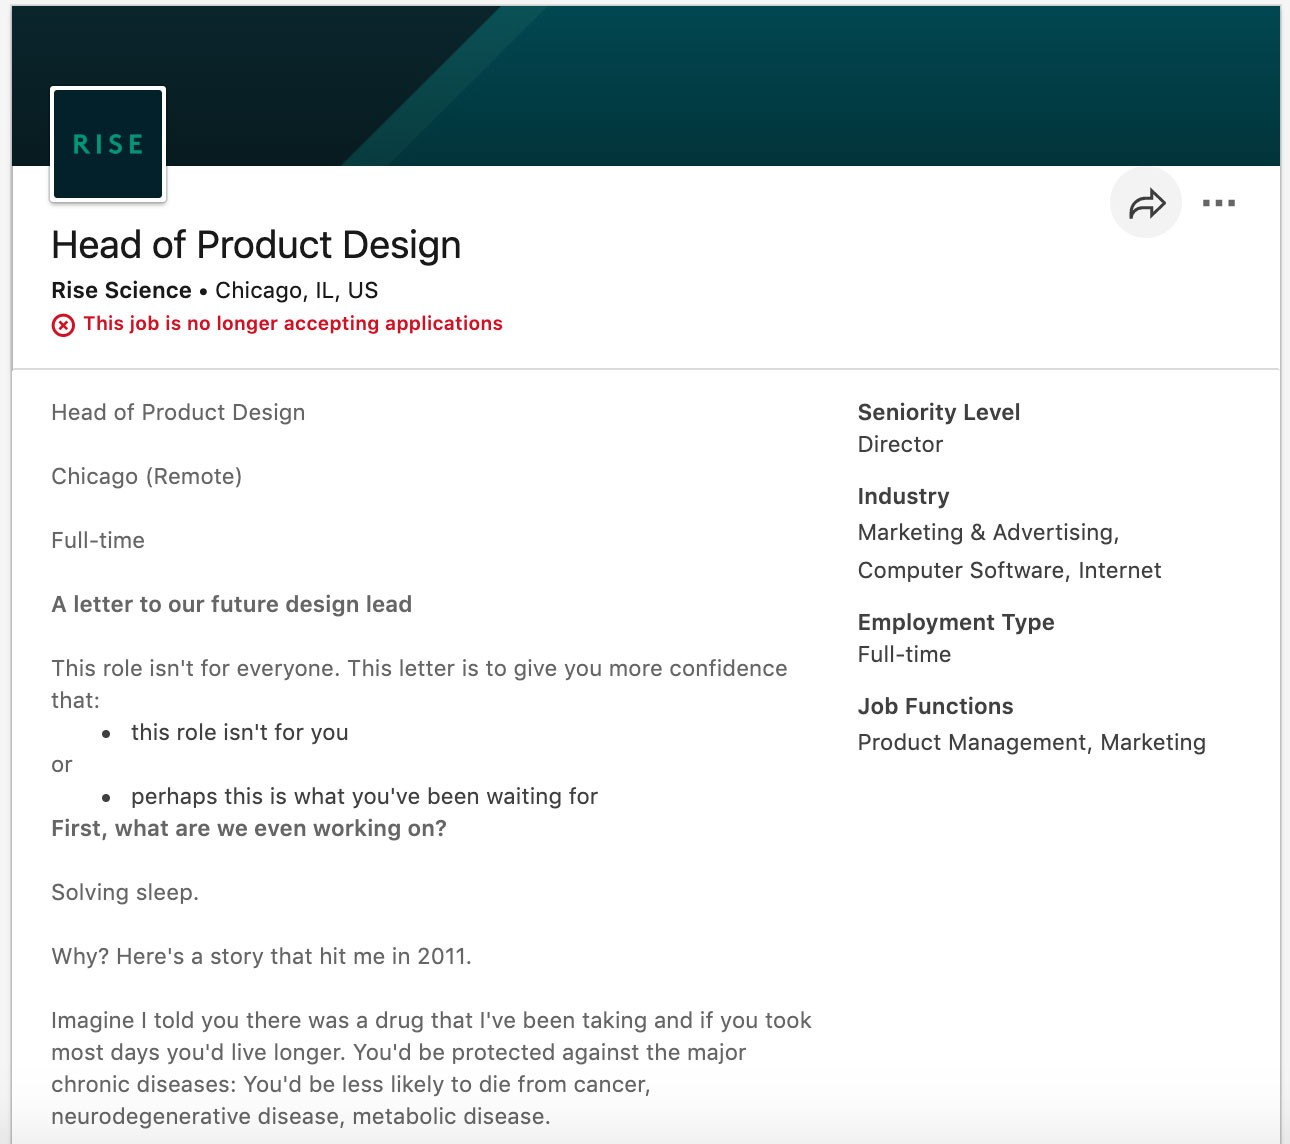 rise head of product job description